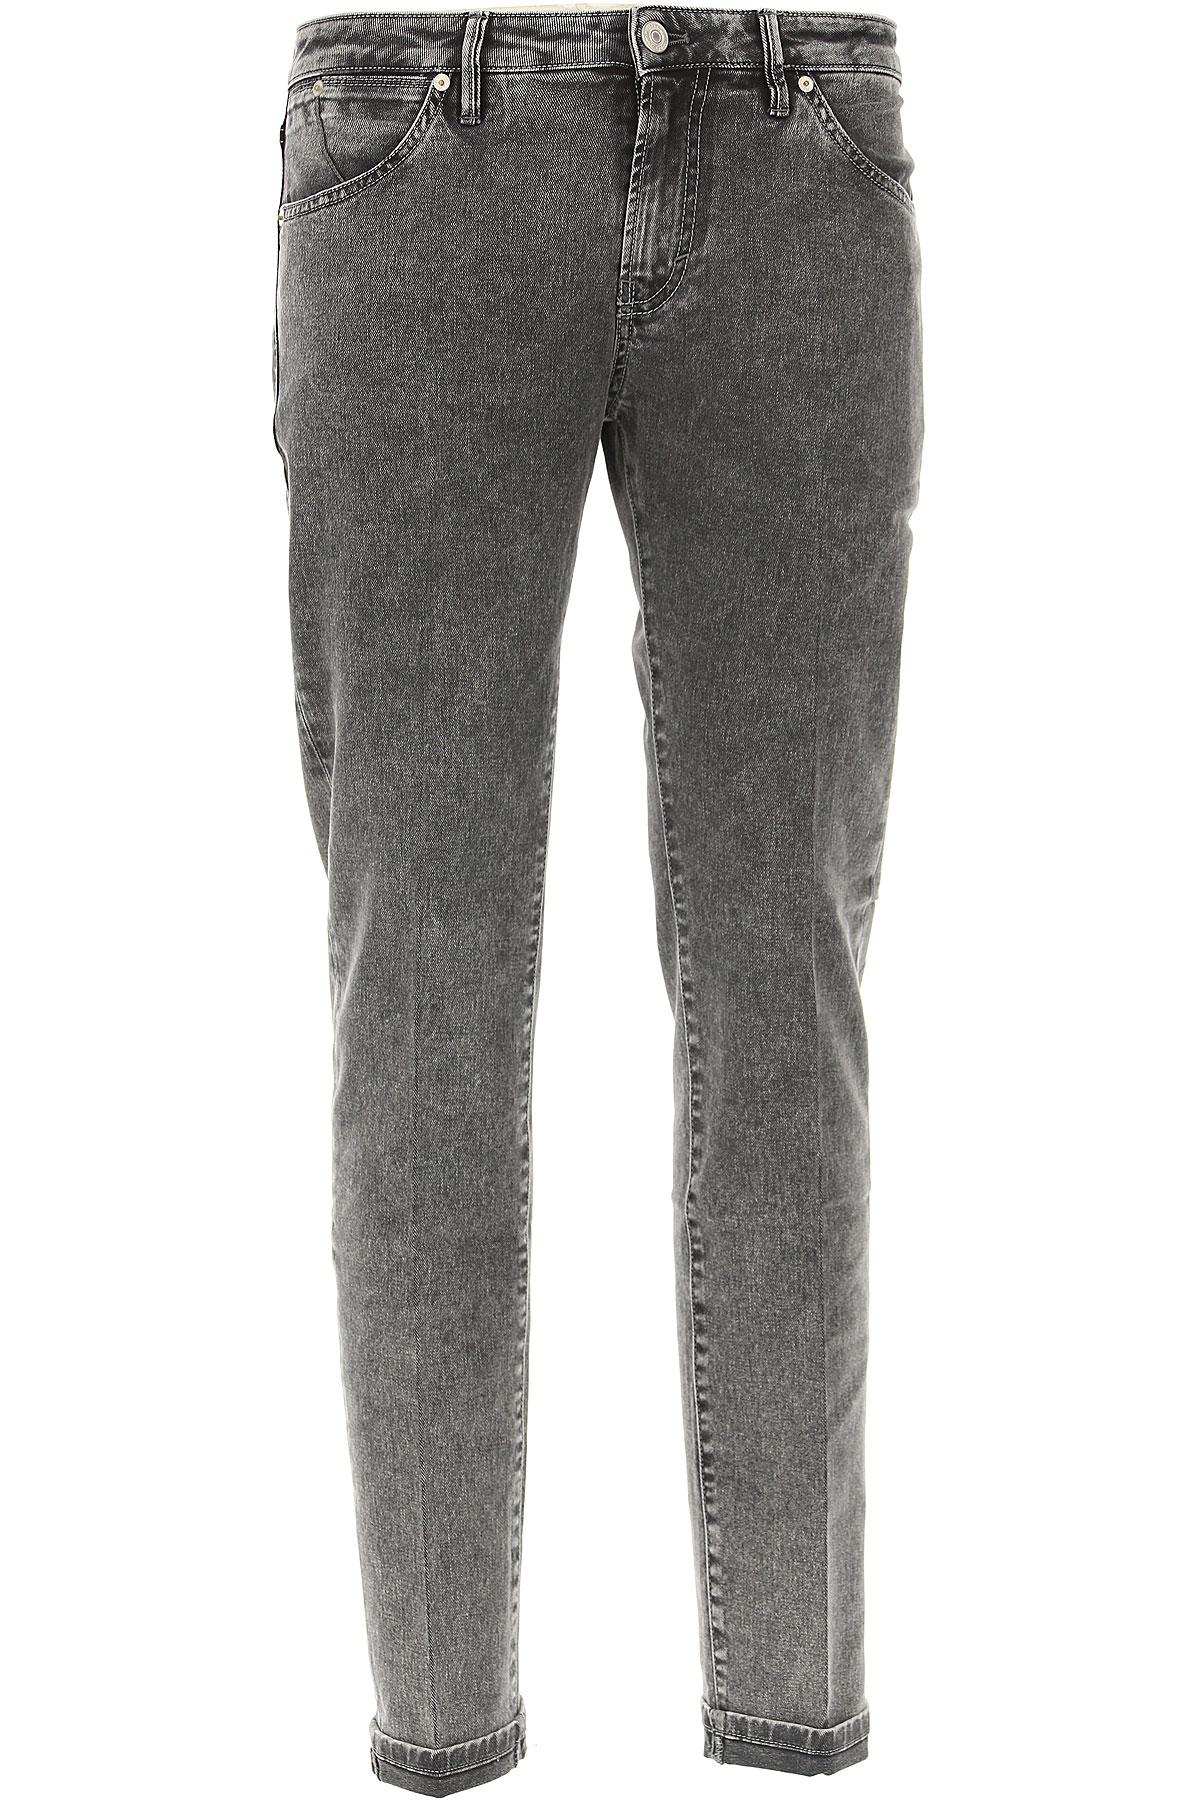 Image of PT05 Jeans, Denim Grey, Cotton, 2017, 30 31 32 33 34 35 36